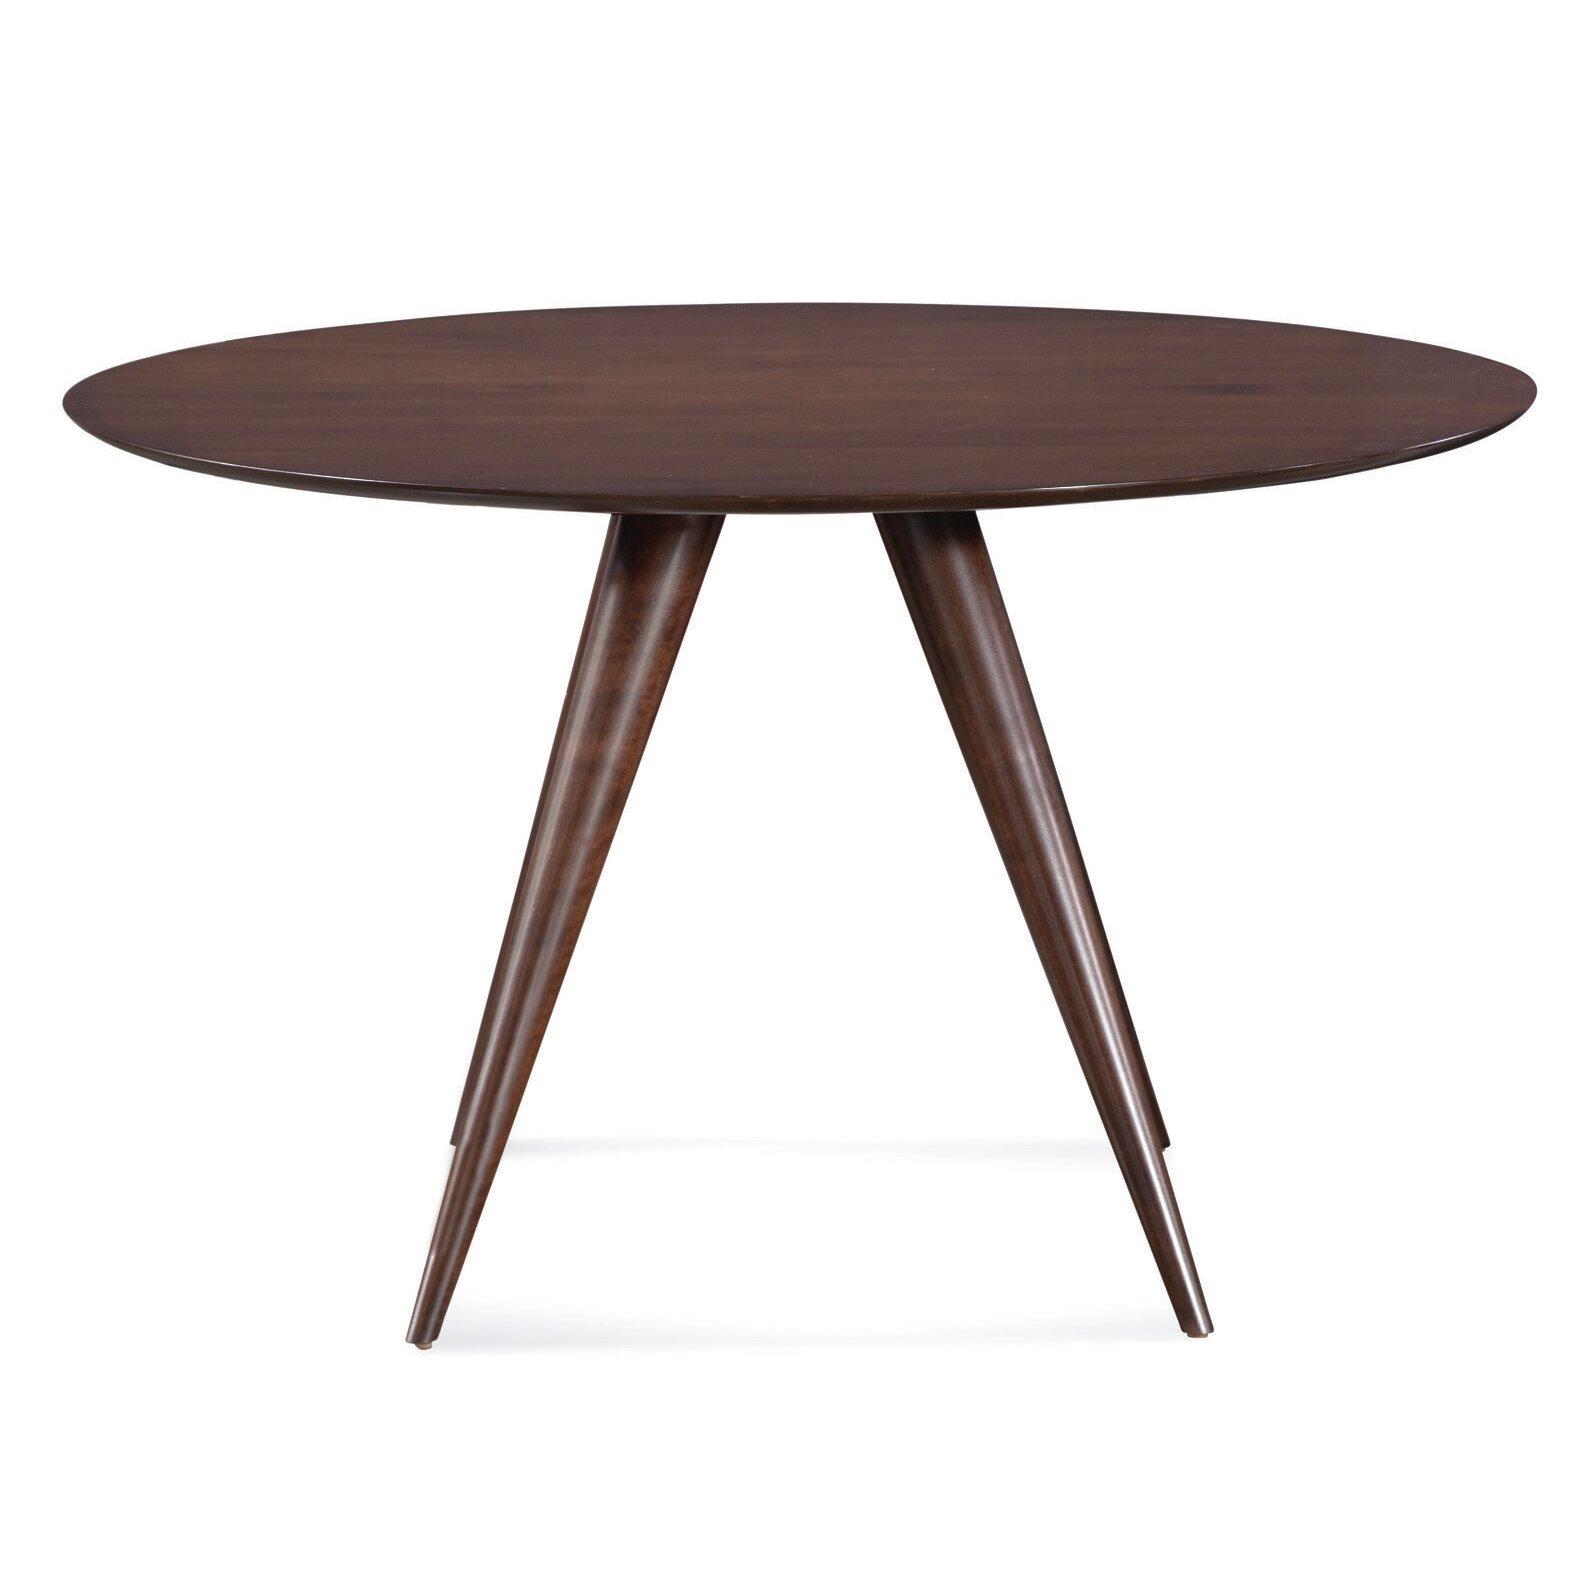 Saloom Furniture Iris 42 Dining Table Reviews Wayfair